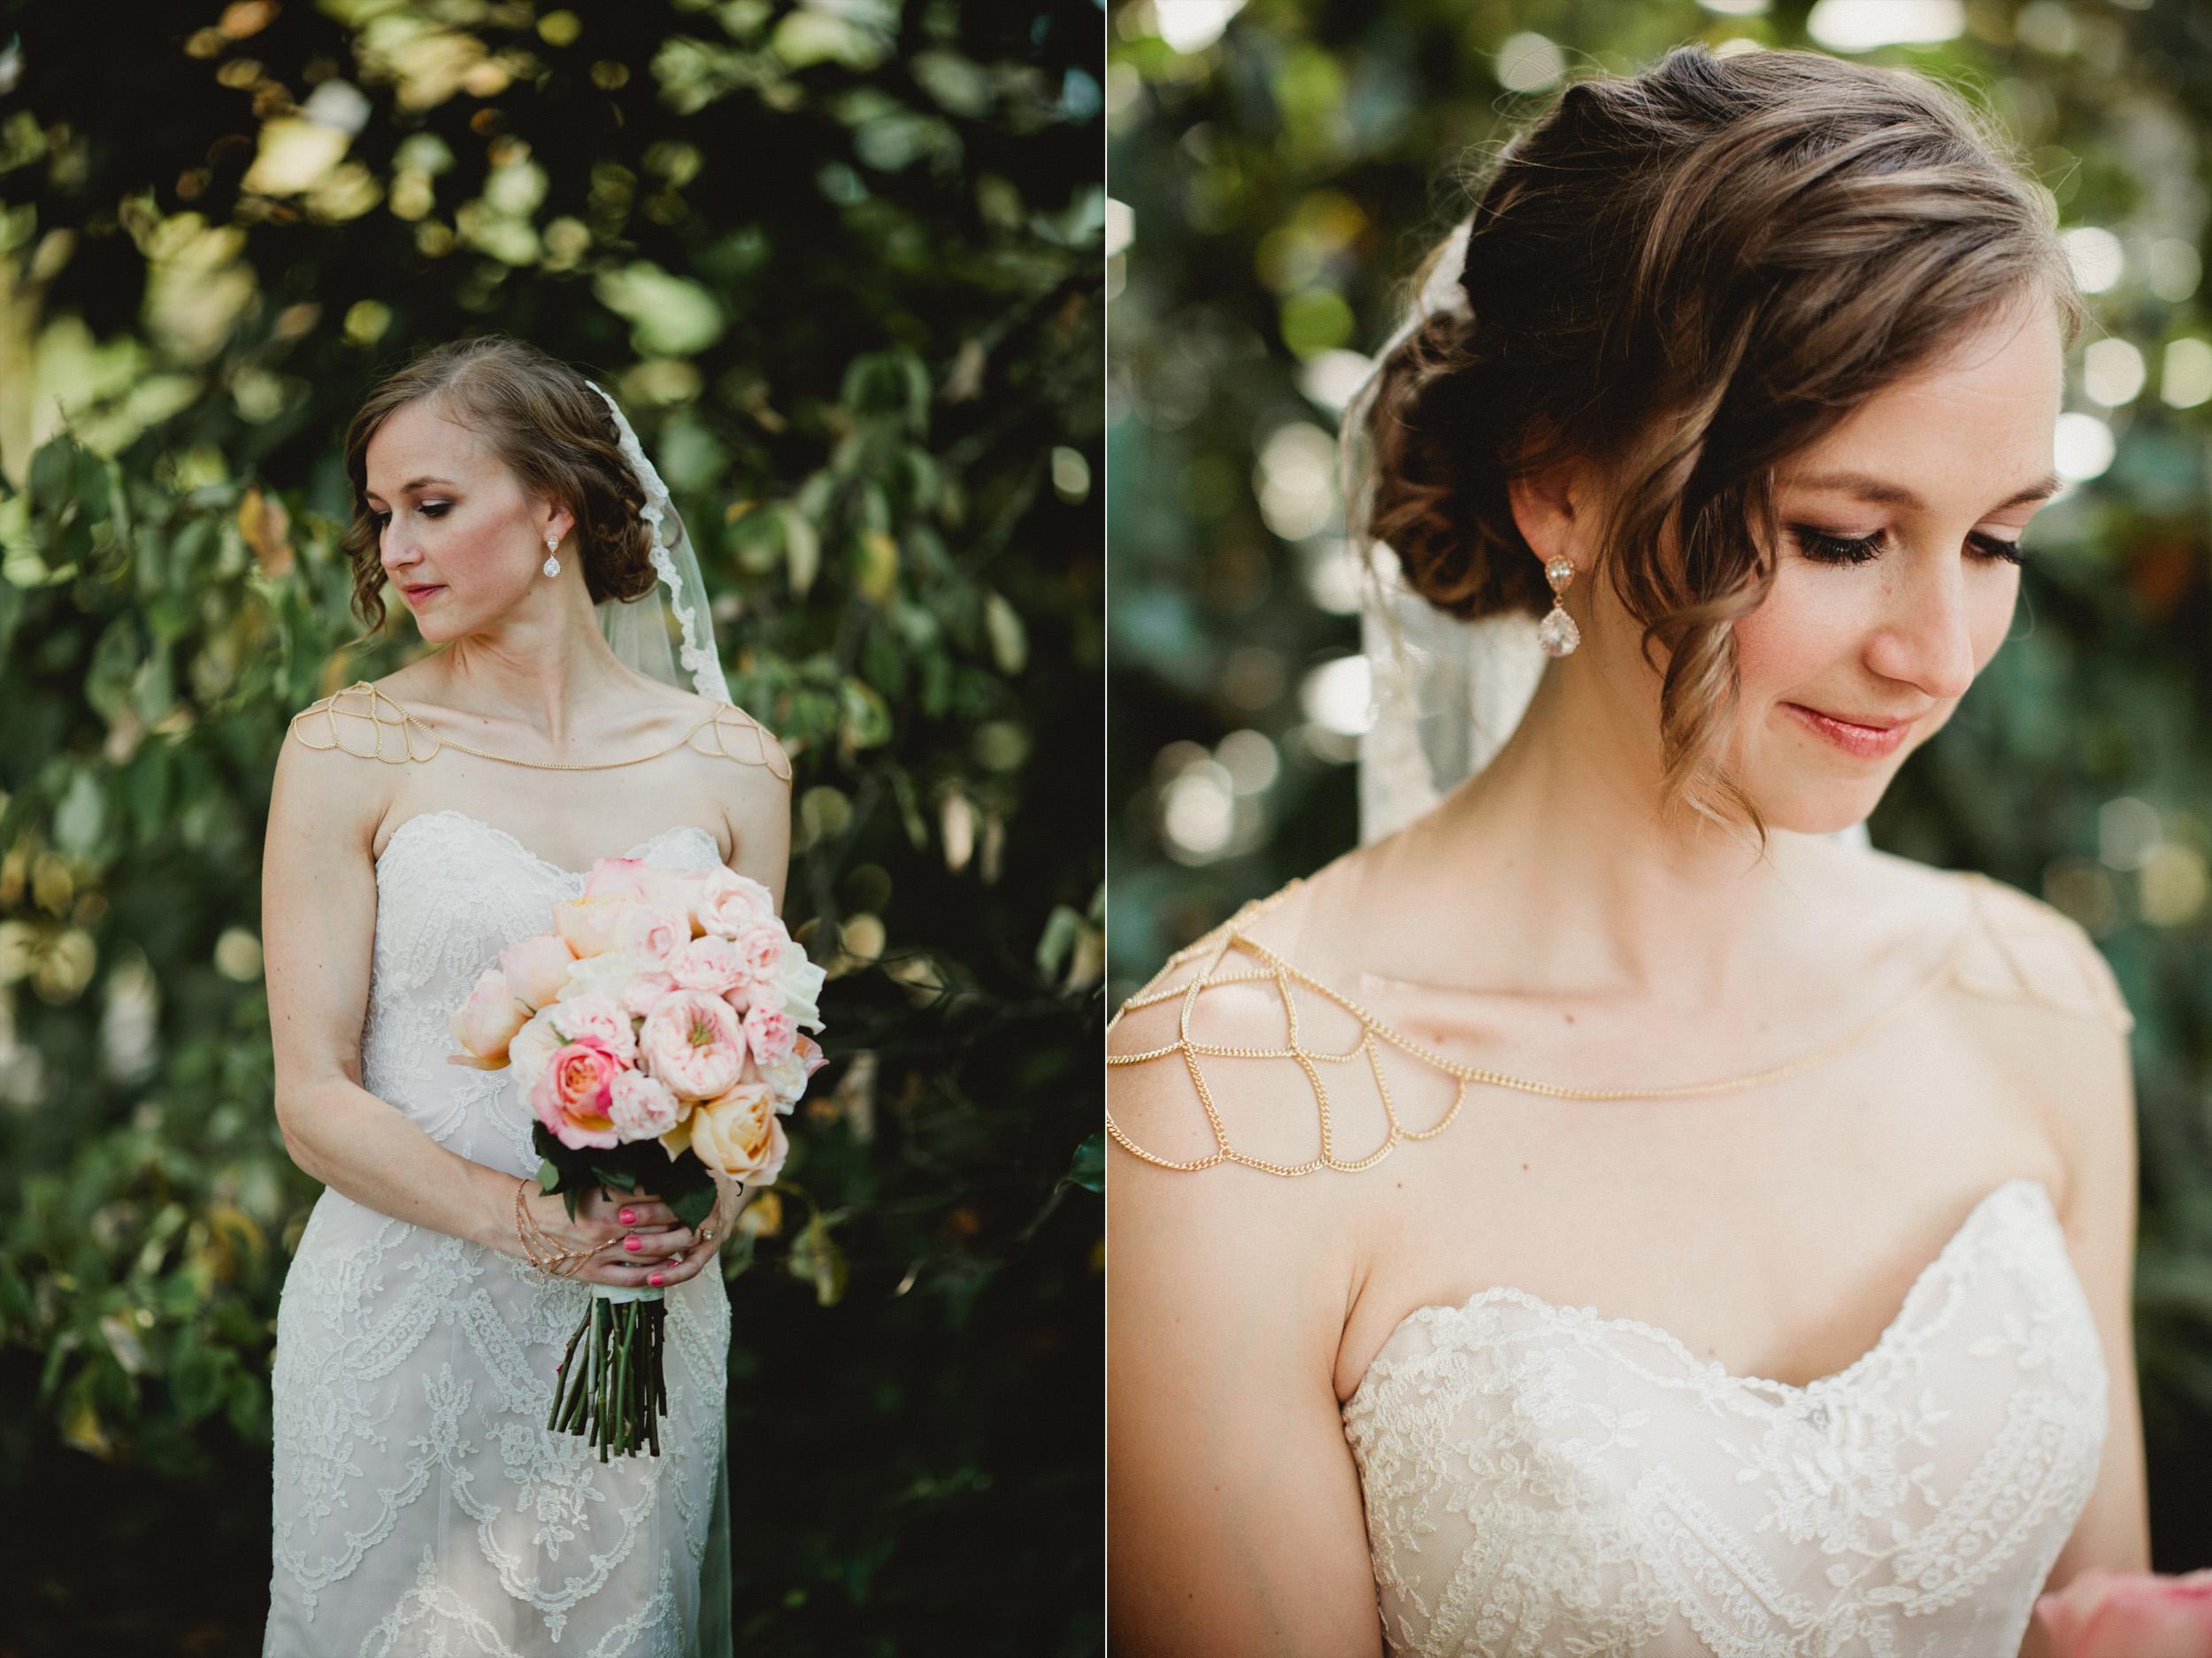 Maine-Wedding-Photographer-917l.jpg